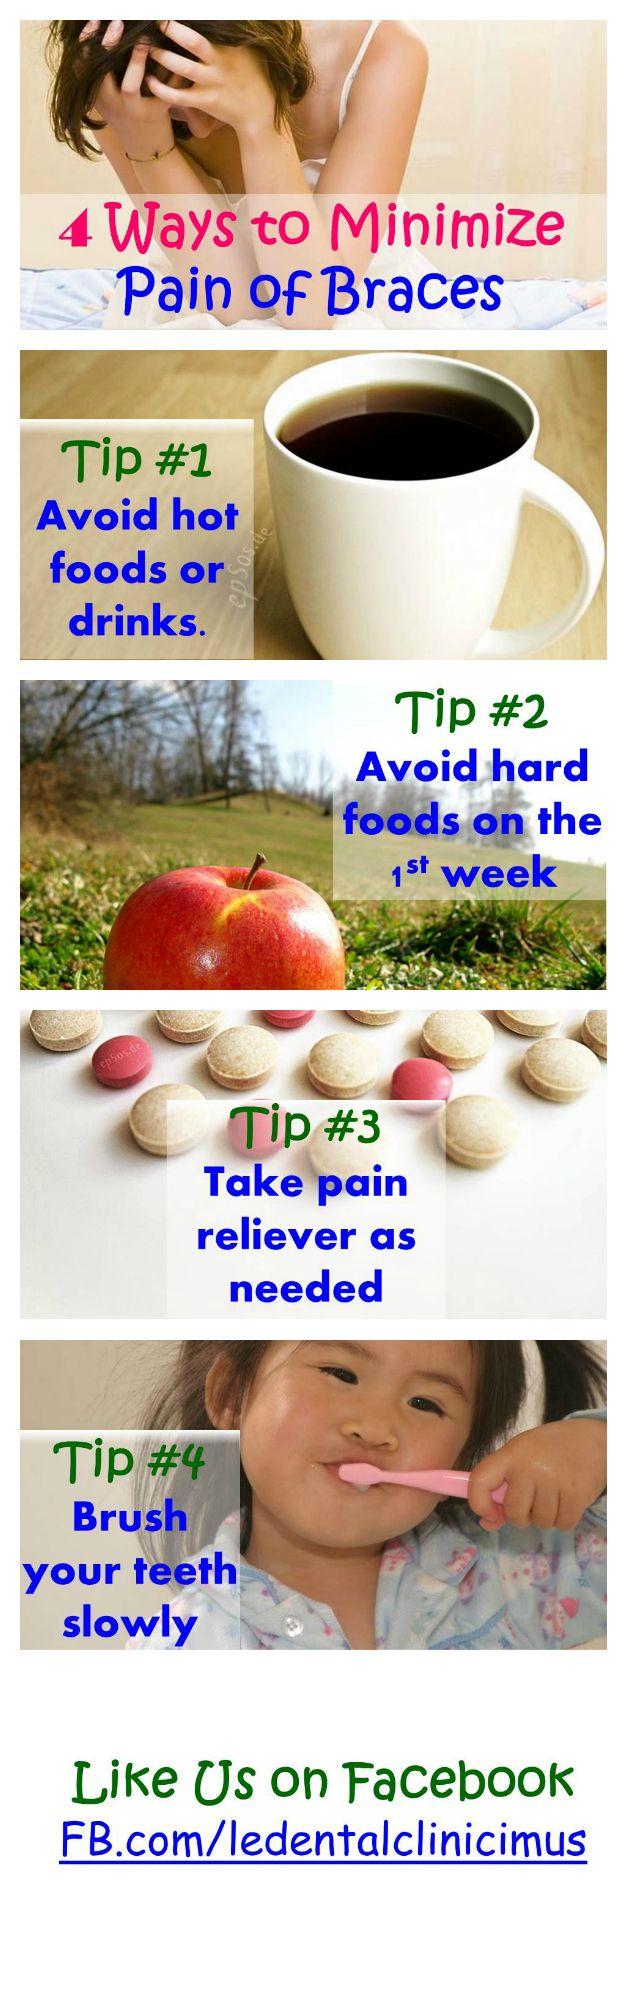 4 Ways to Minimize Pain of Braces  Learn more   https://www.facebook.com/ledentalclinicimus